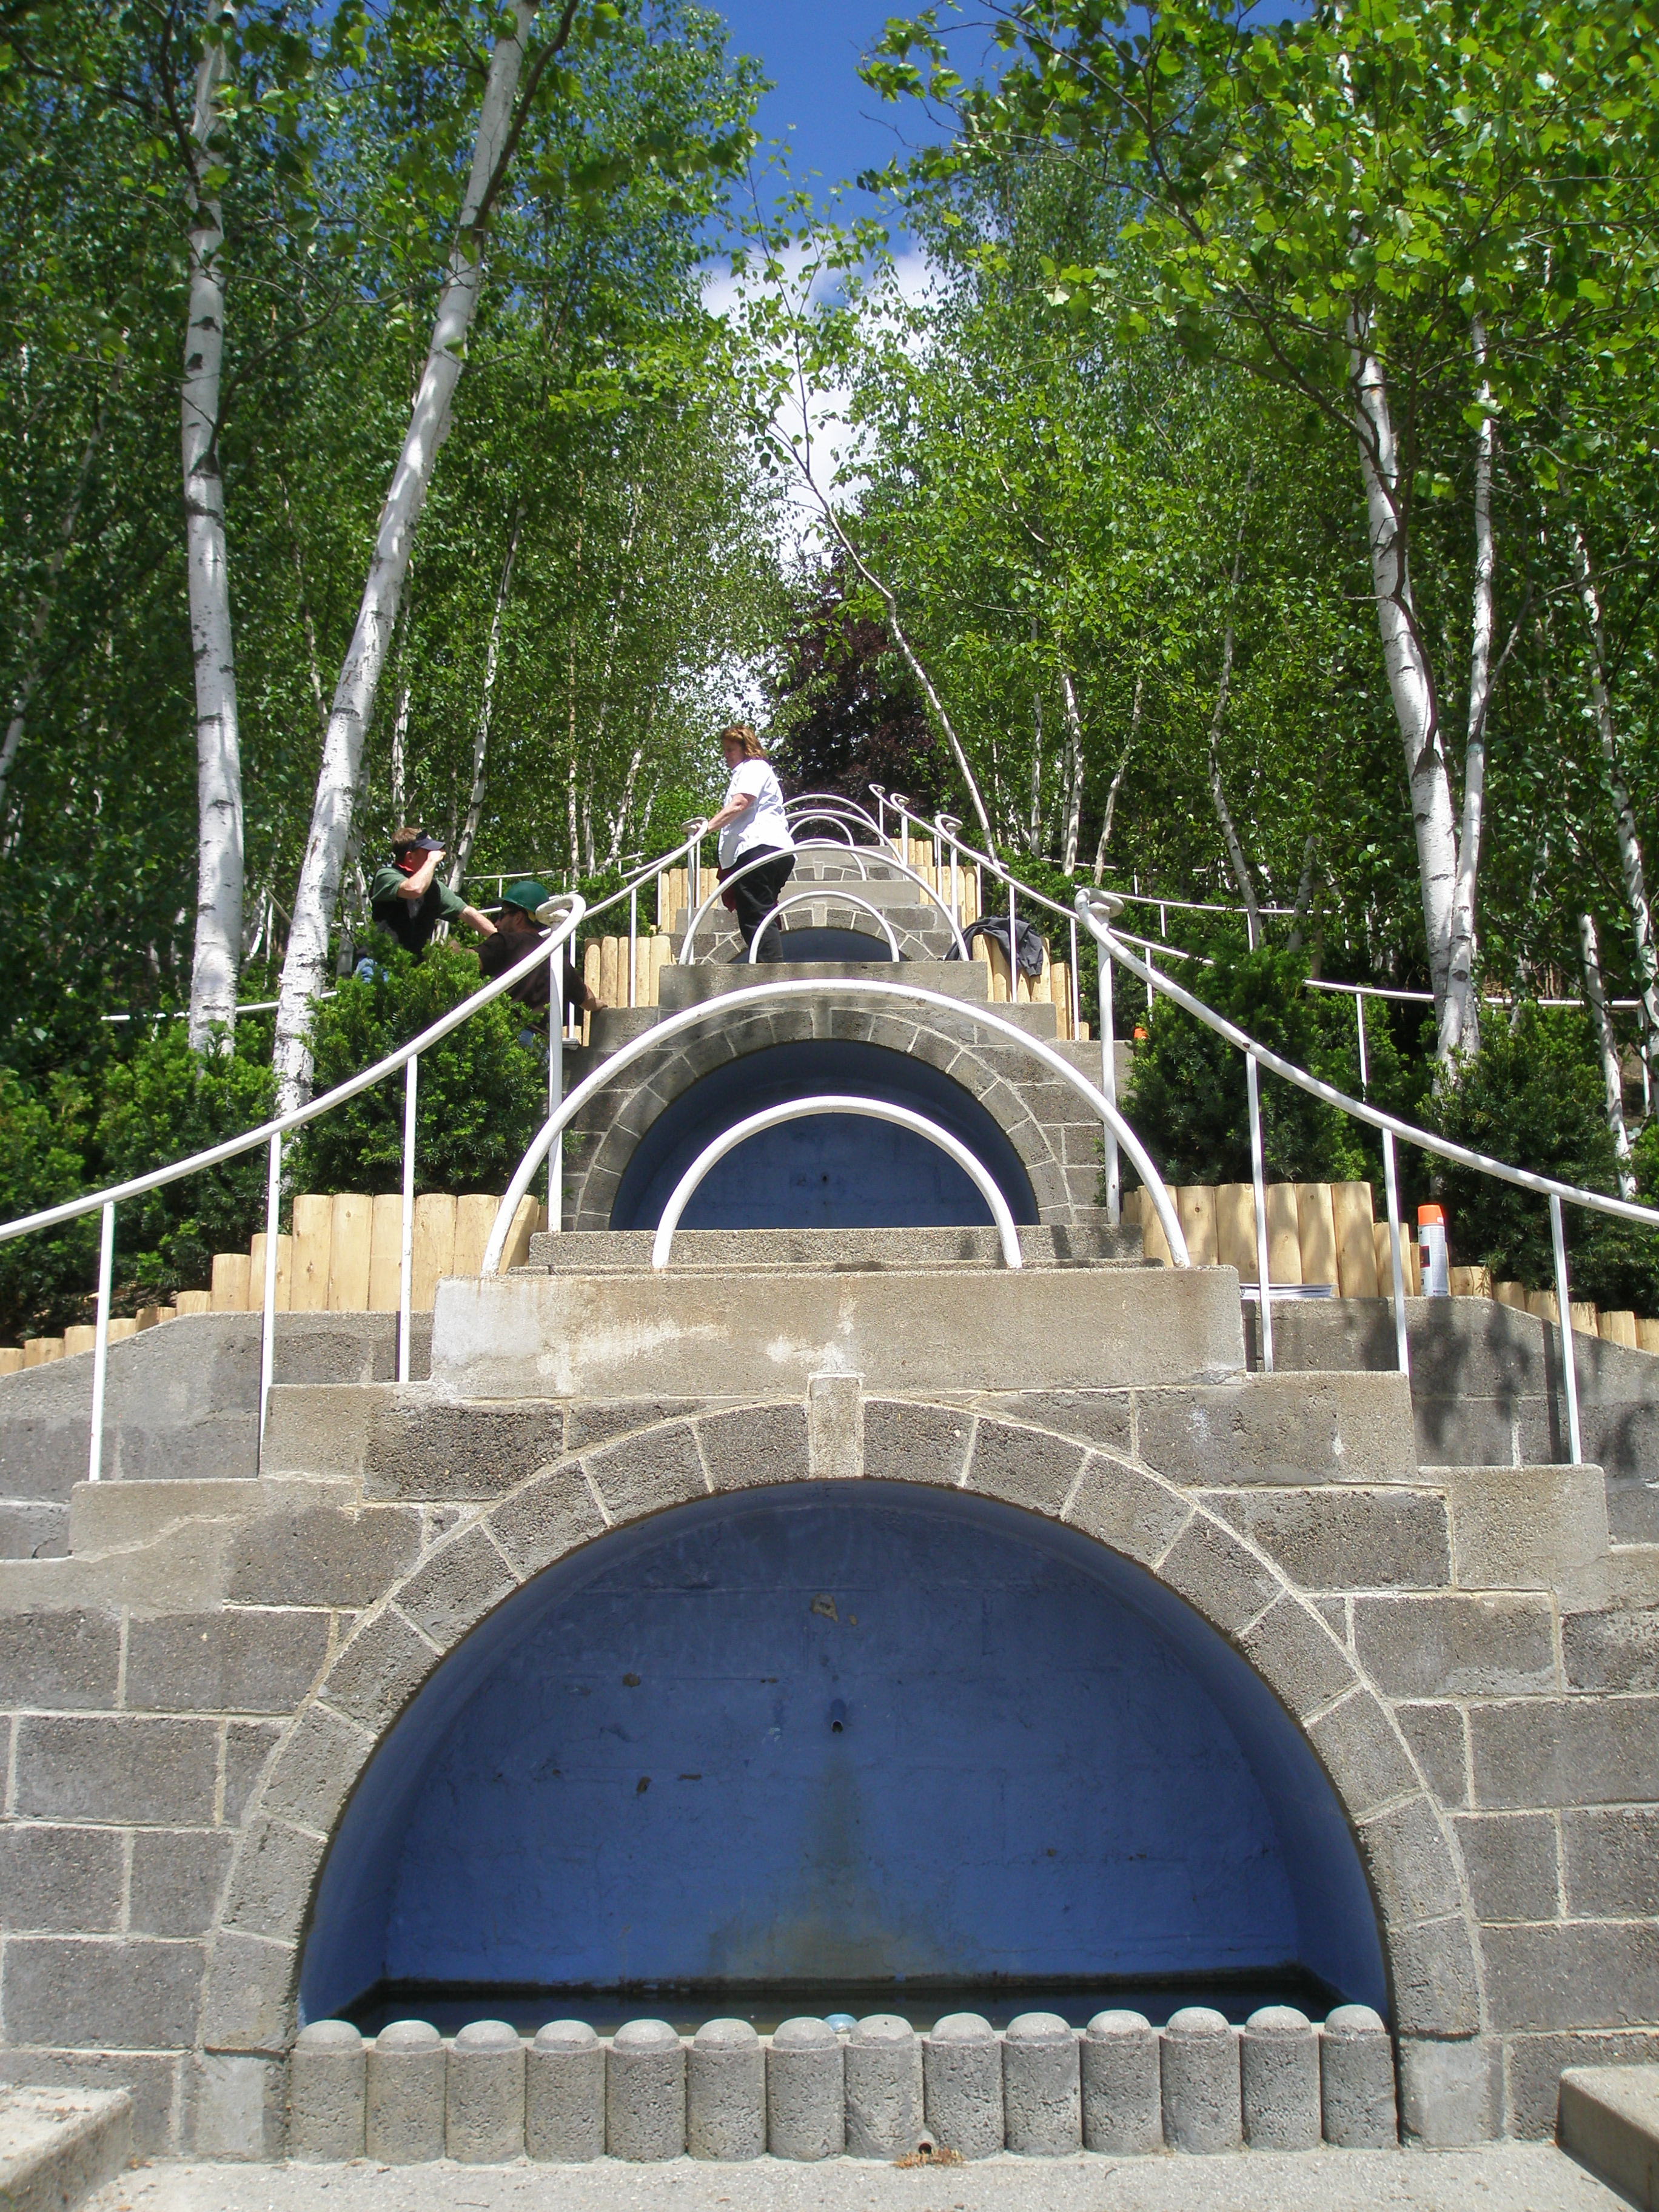 Blue Steps To Success: Grand Gardens Of The Berkshire Hills: Fletcher Steele's